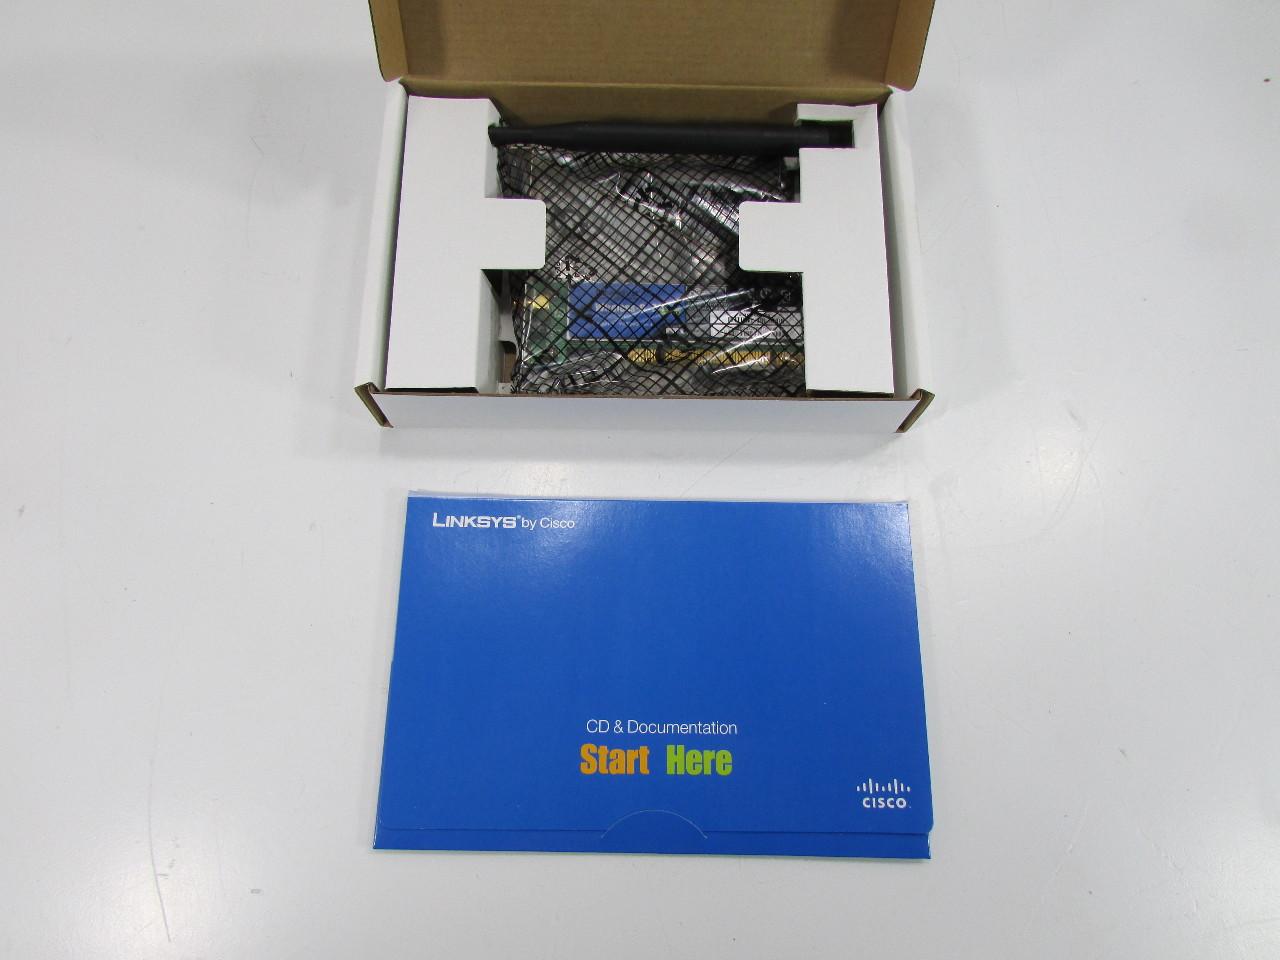 Linksys WMP54G Wireless-G PCI Adapter ver. 3 Driver